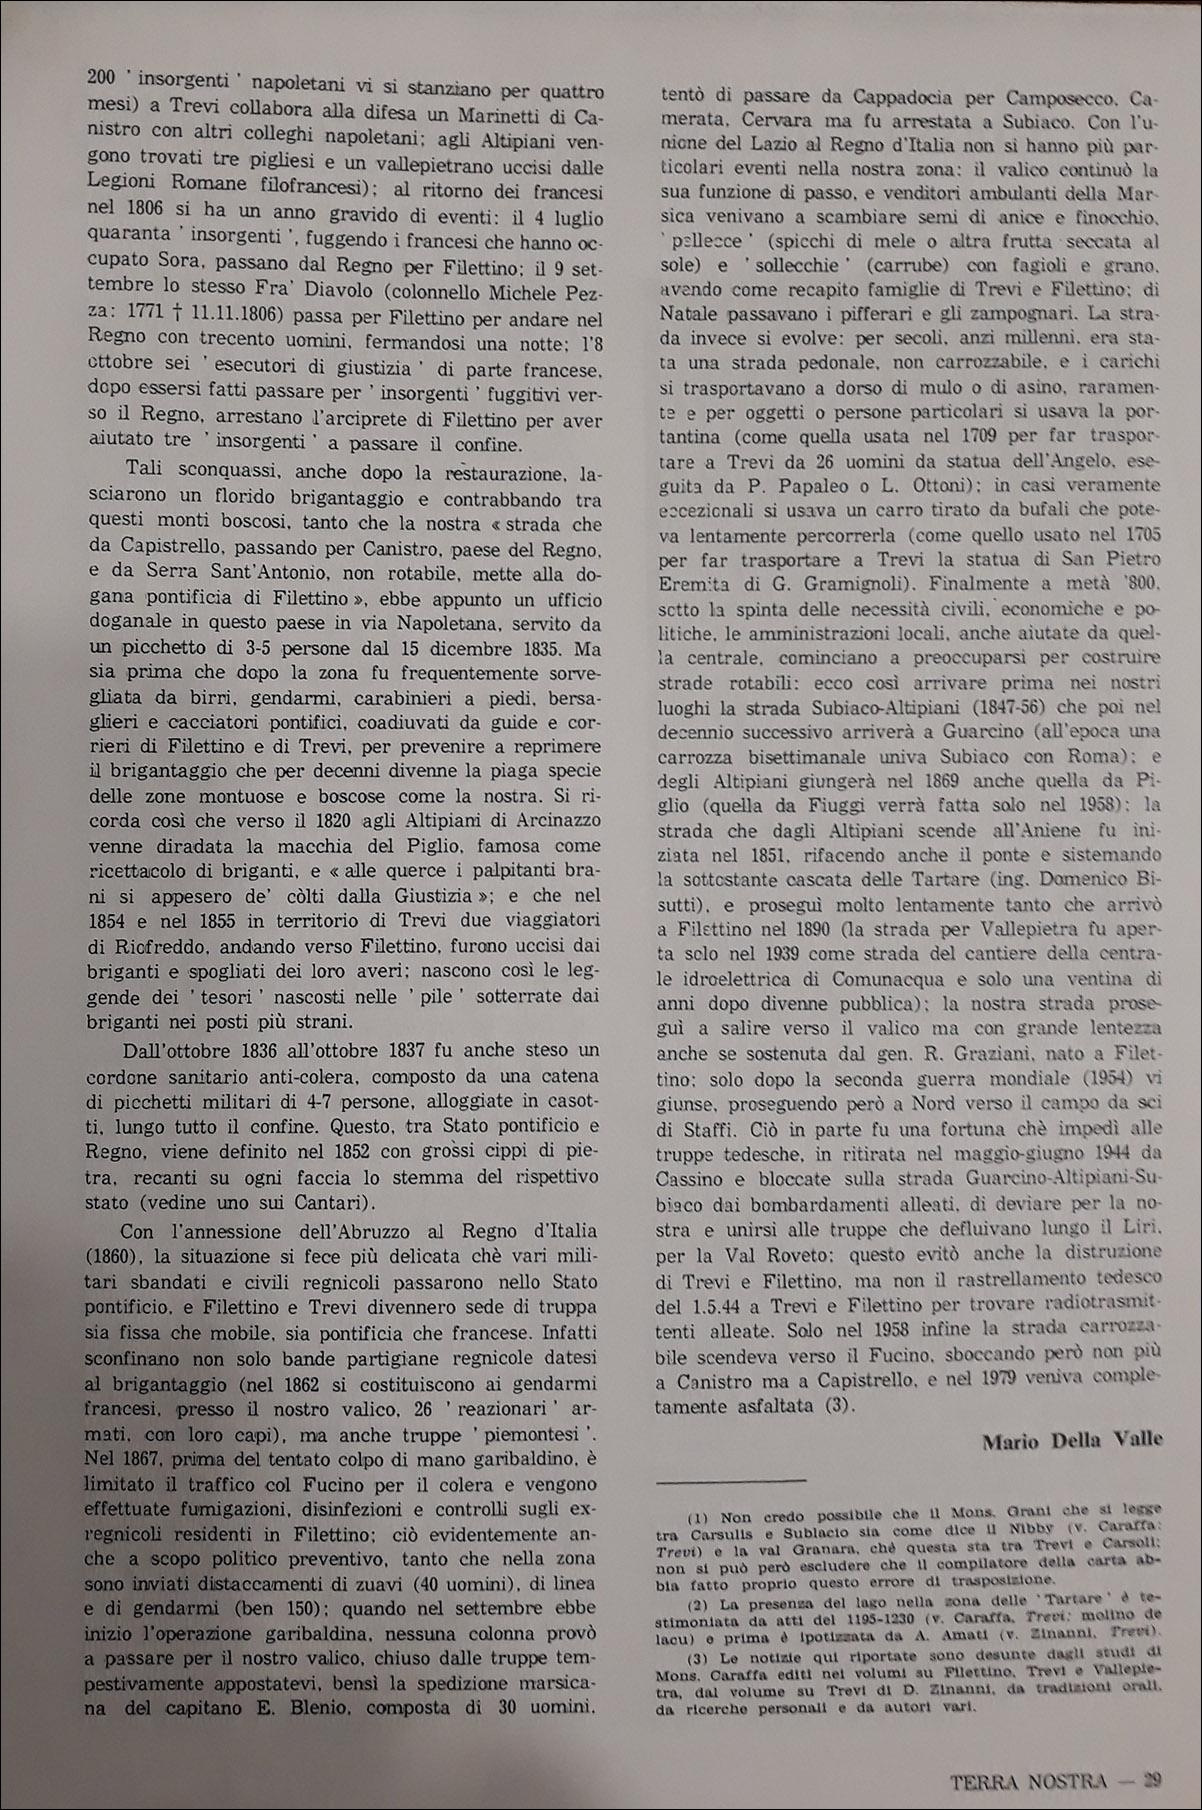 pag 29.jpg